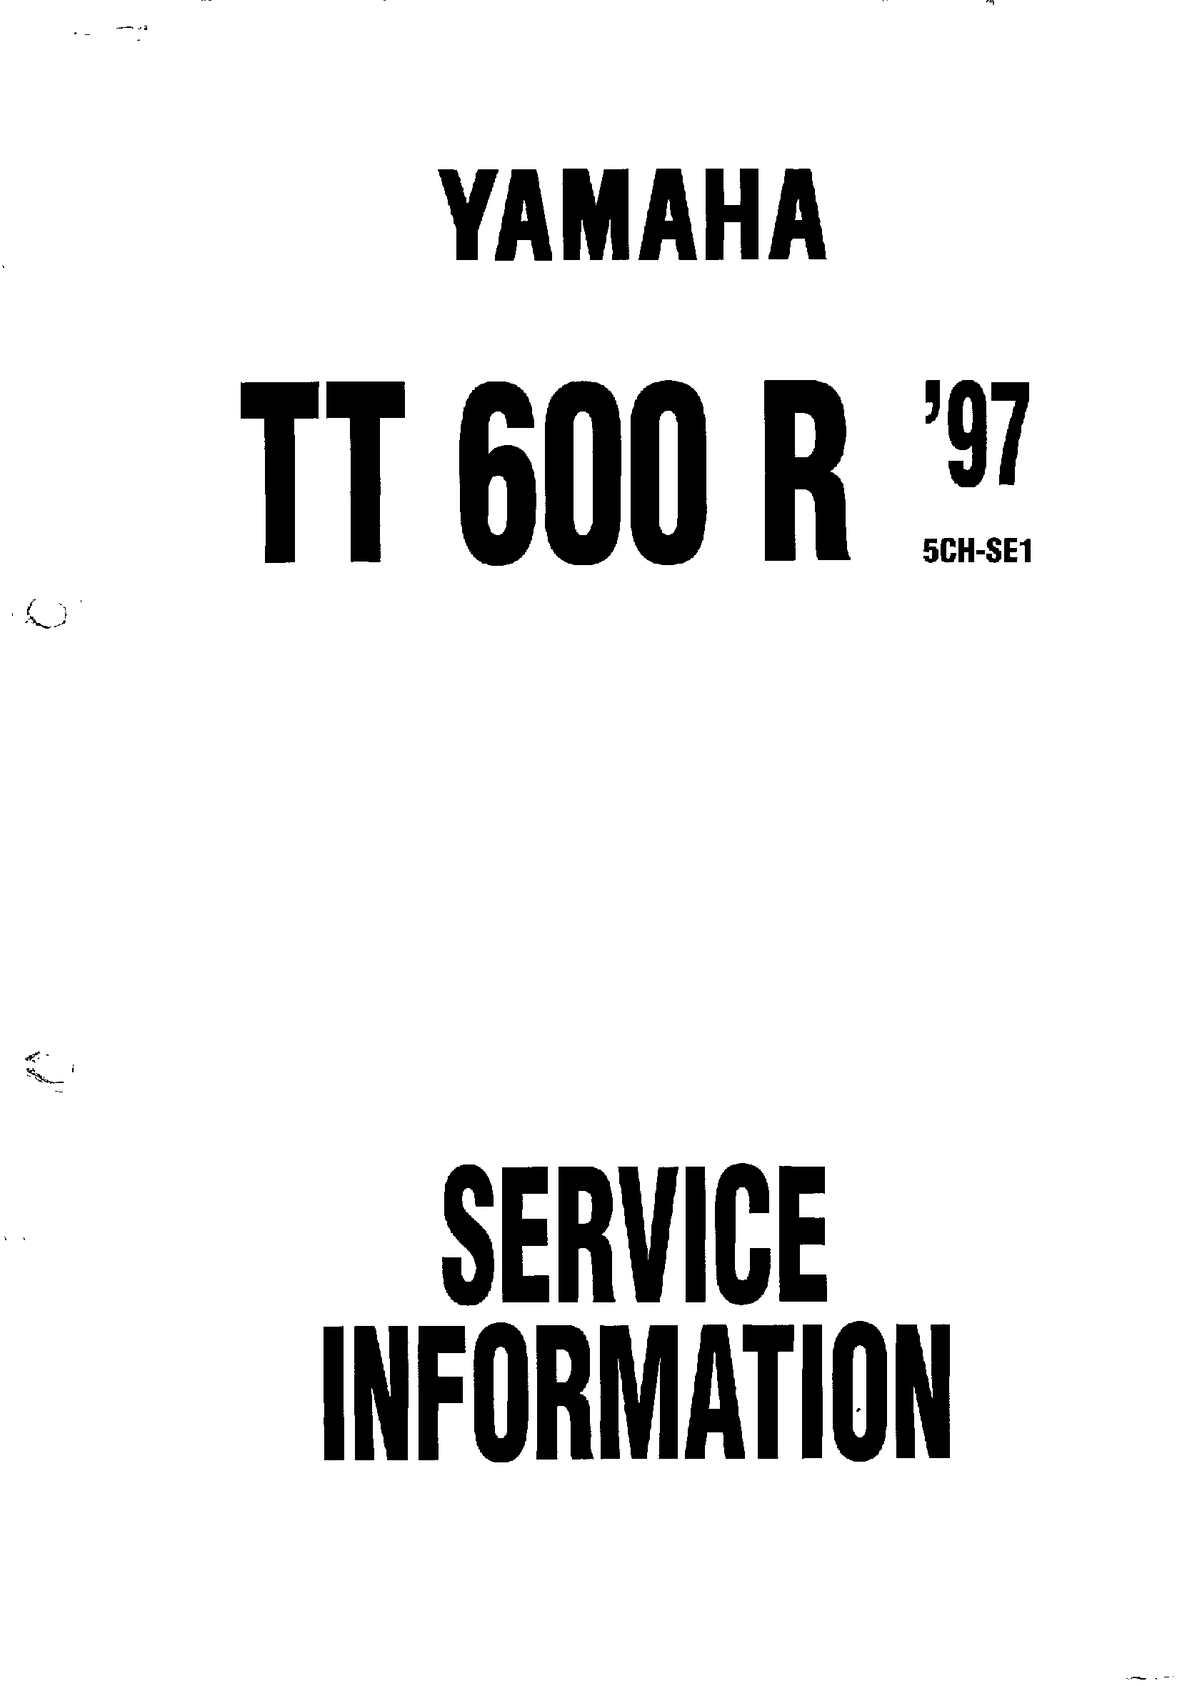 Yamaha tt 600 r service manual